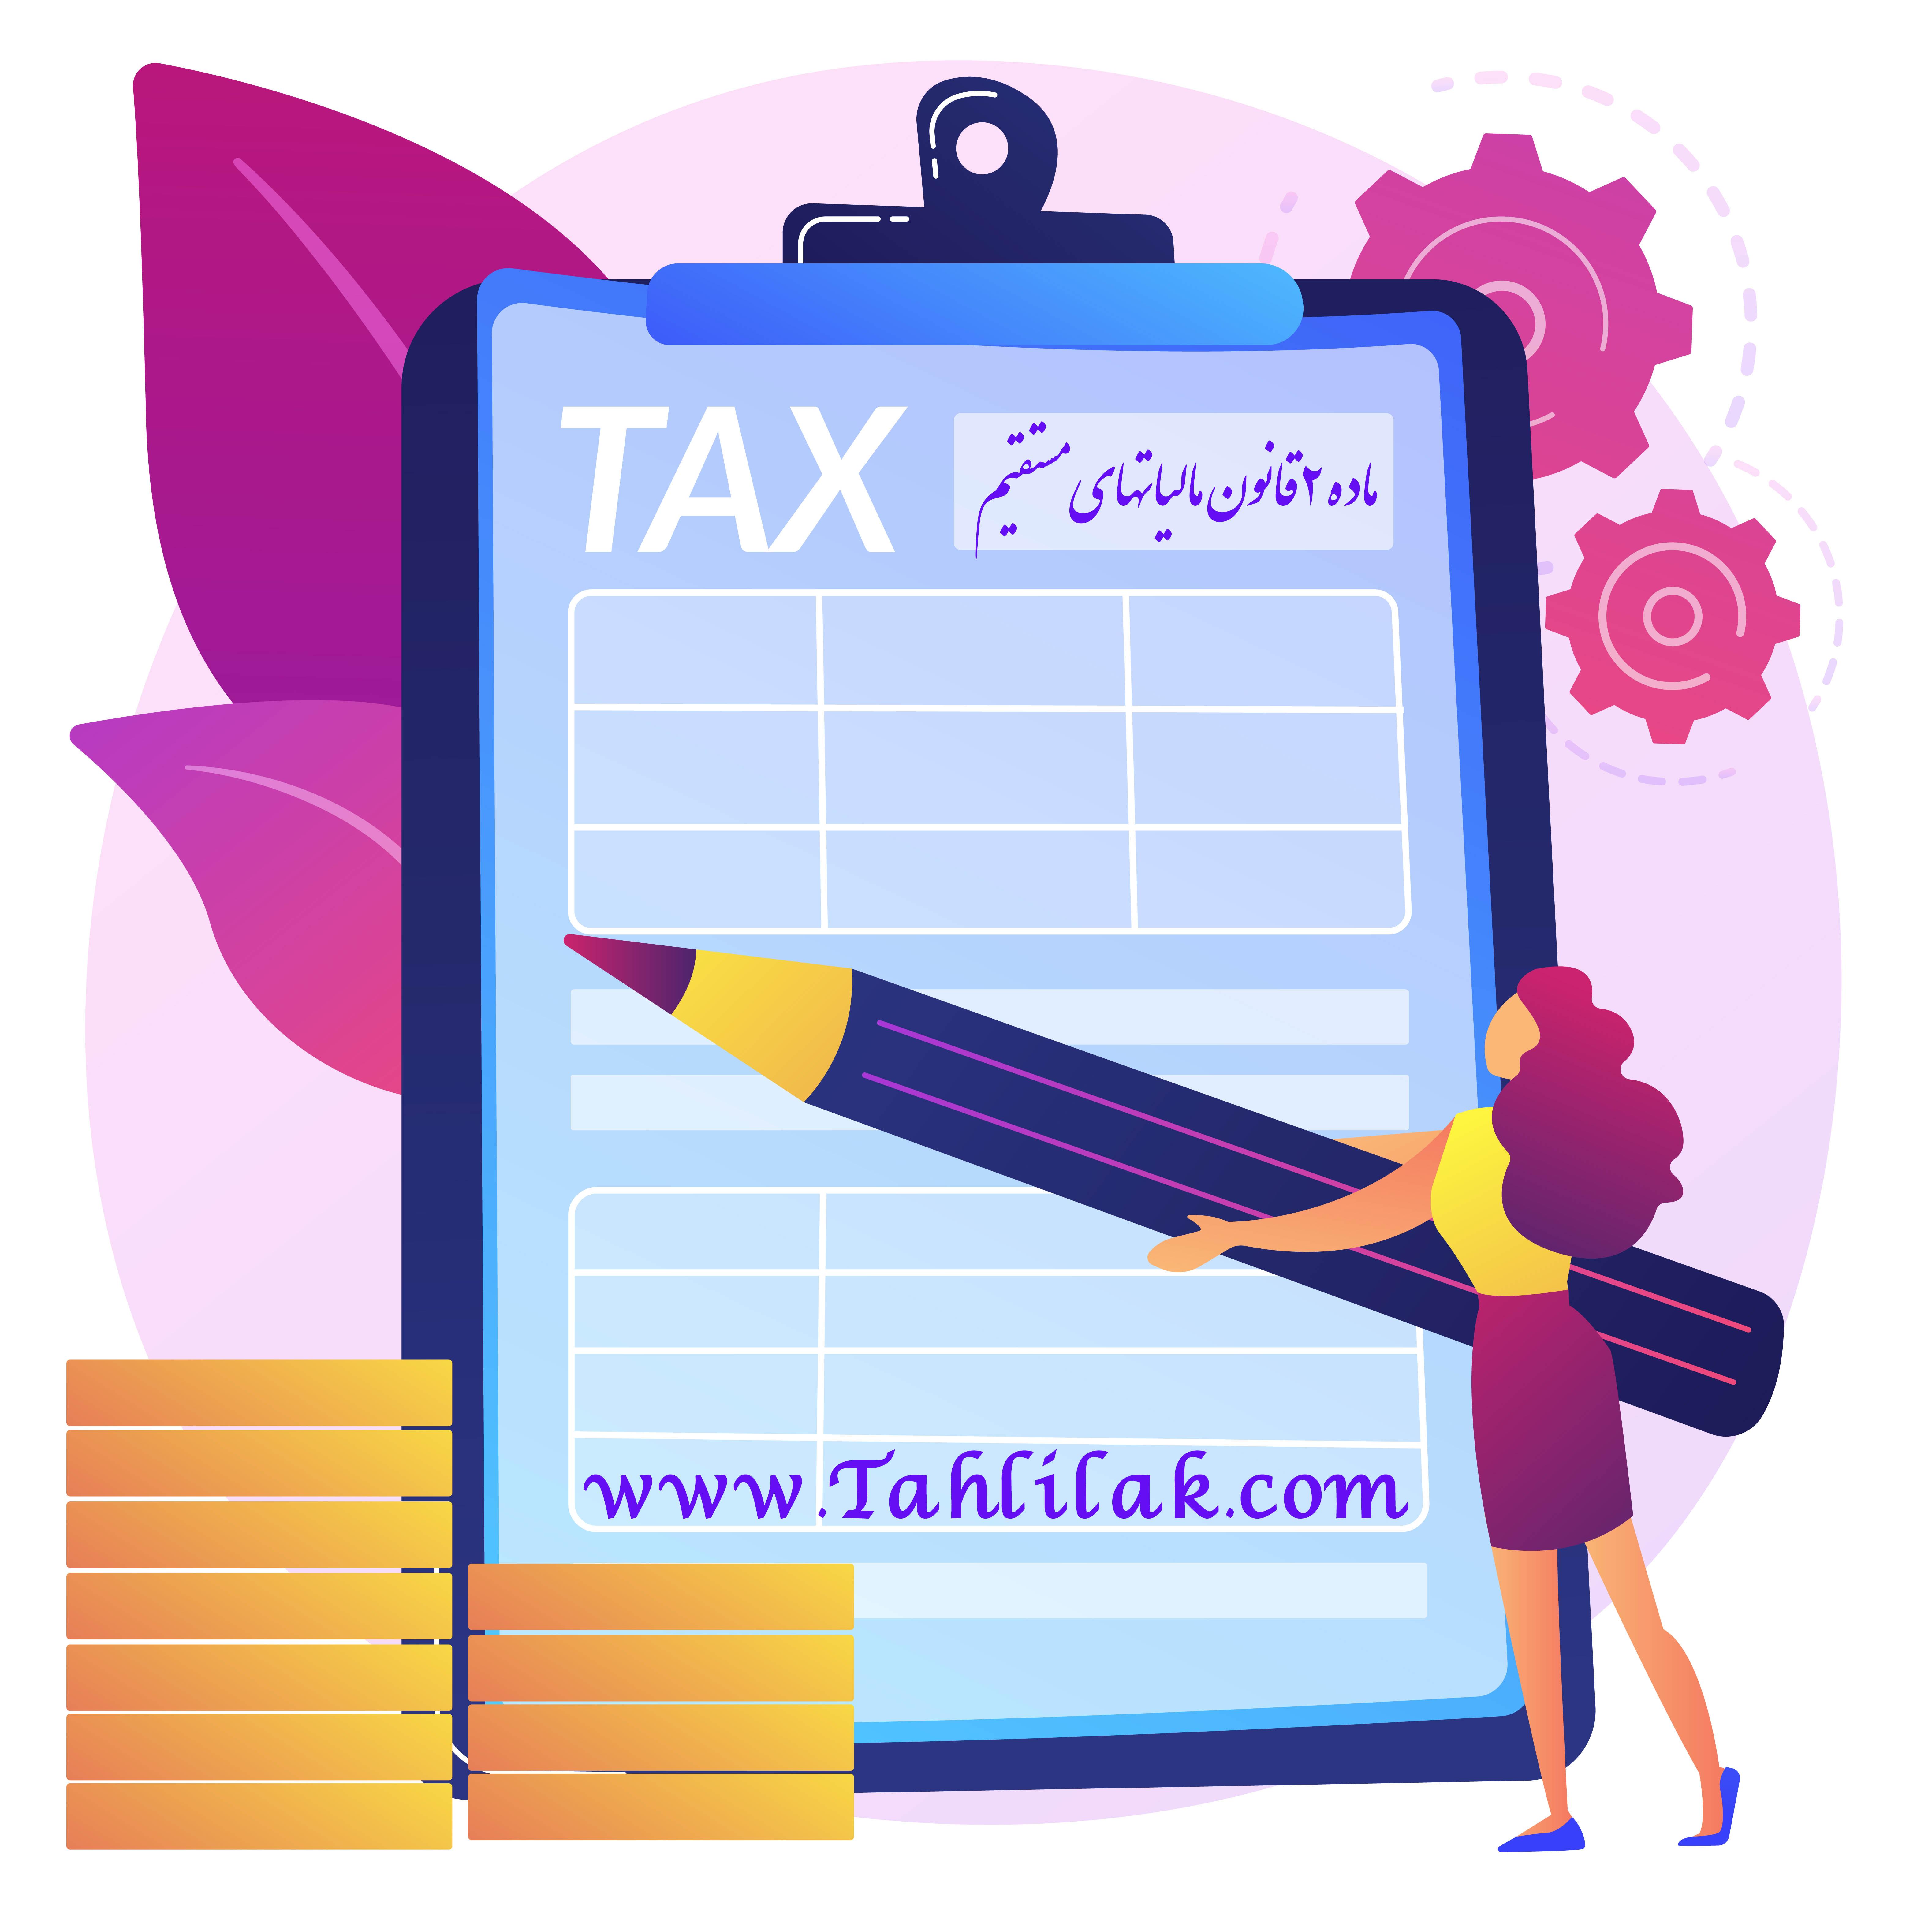 بحثی پیرامون ماده 2 قانون مالیاتهای مستقیم